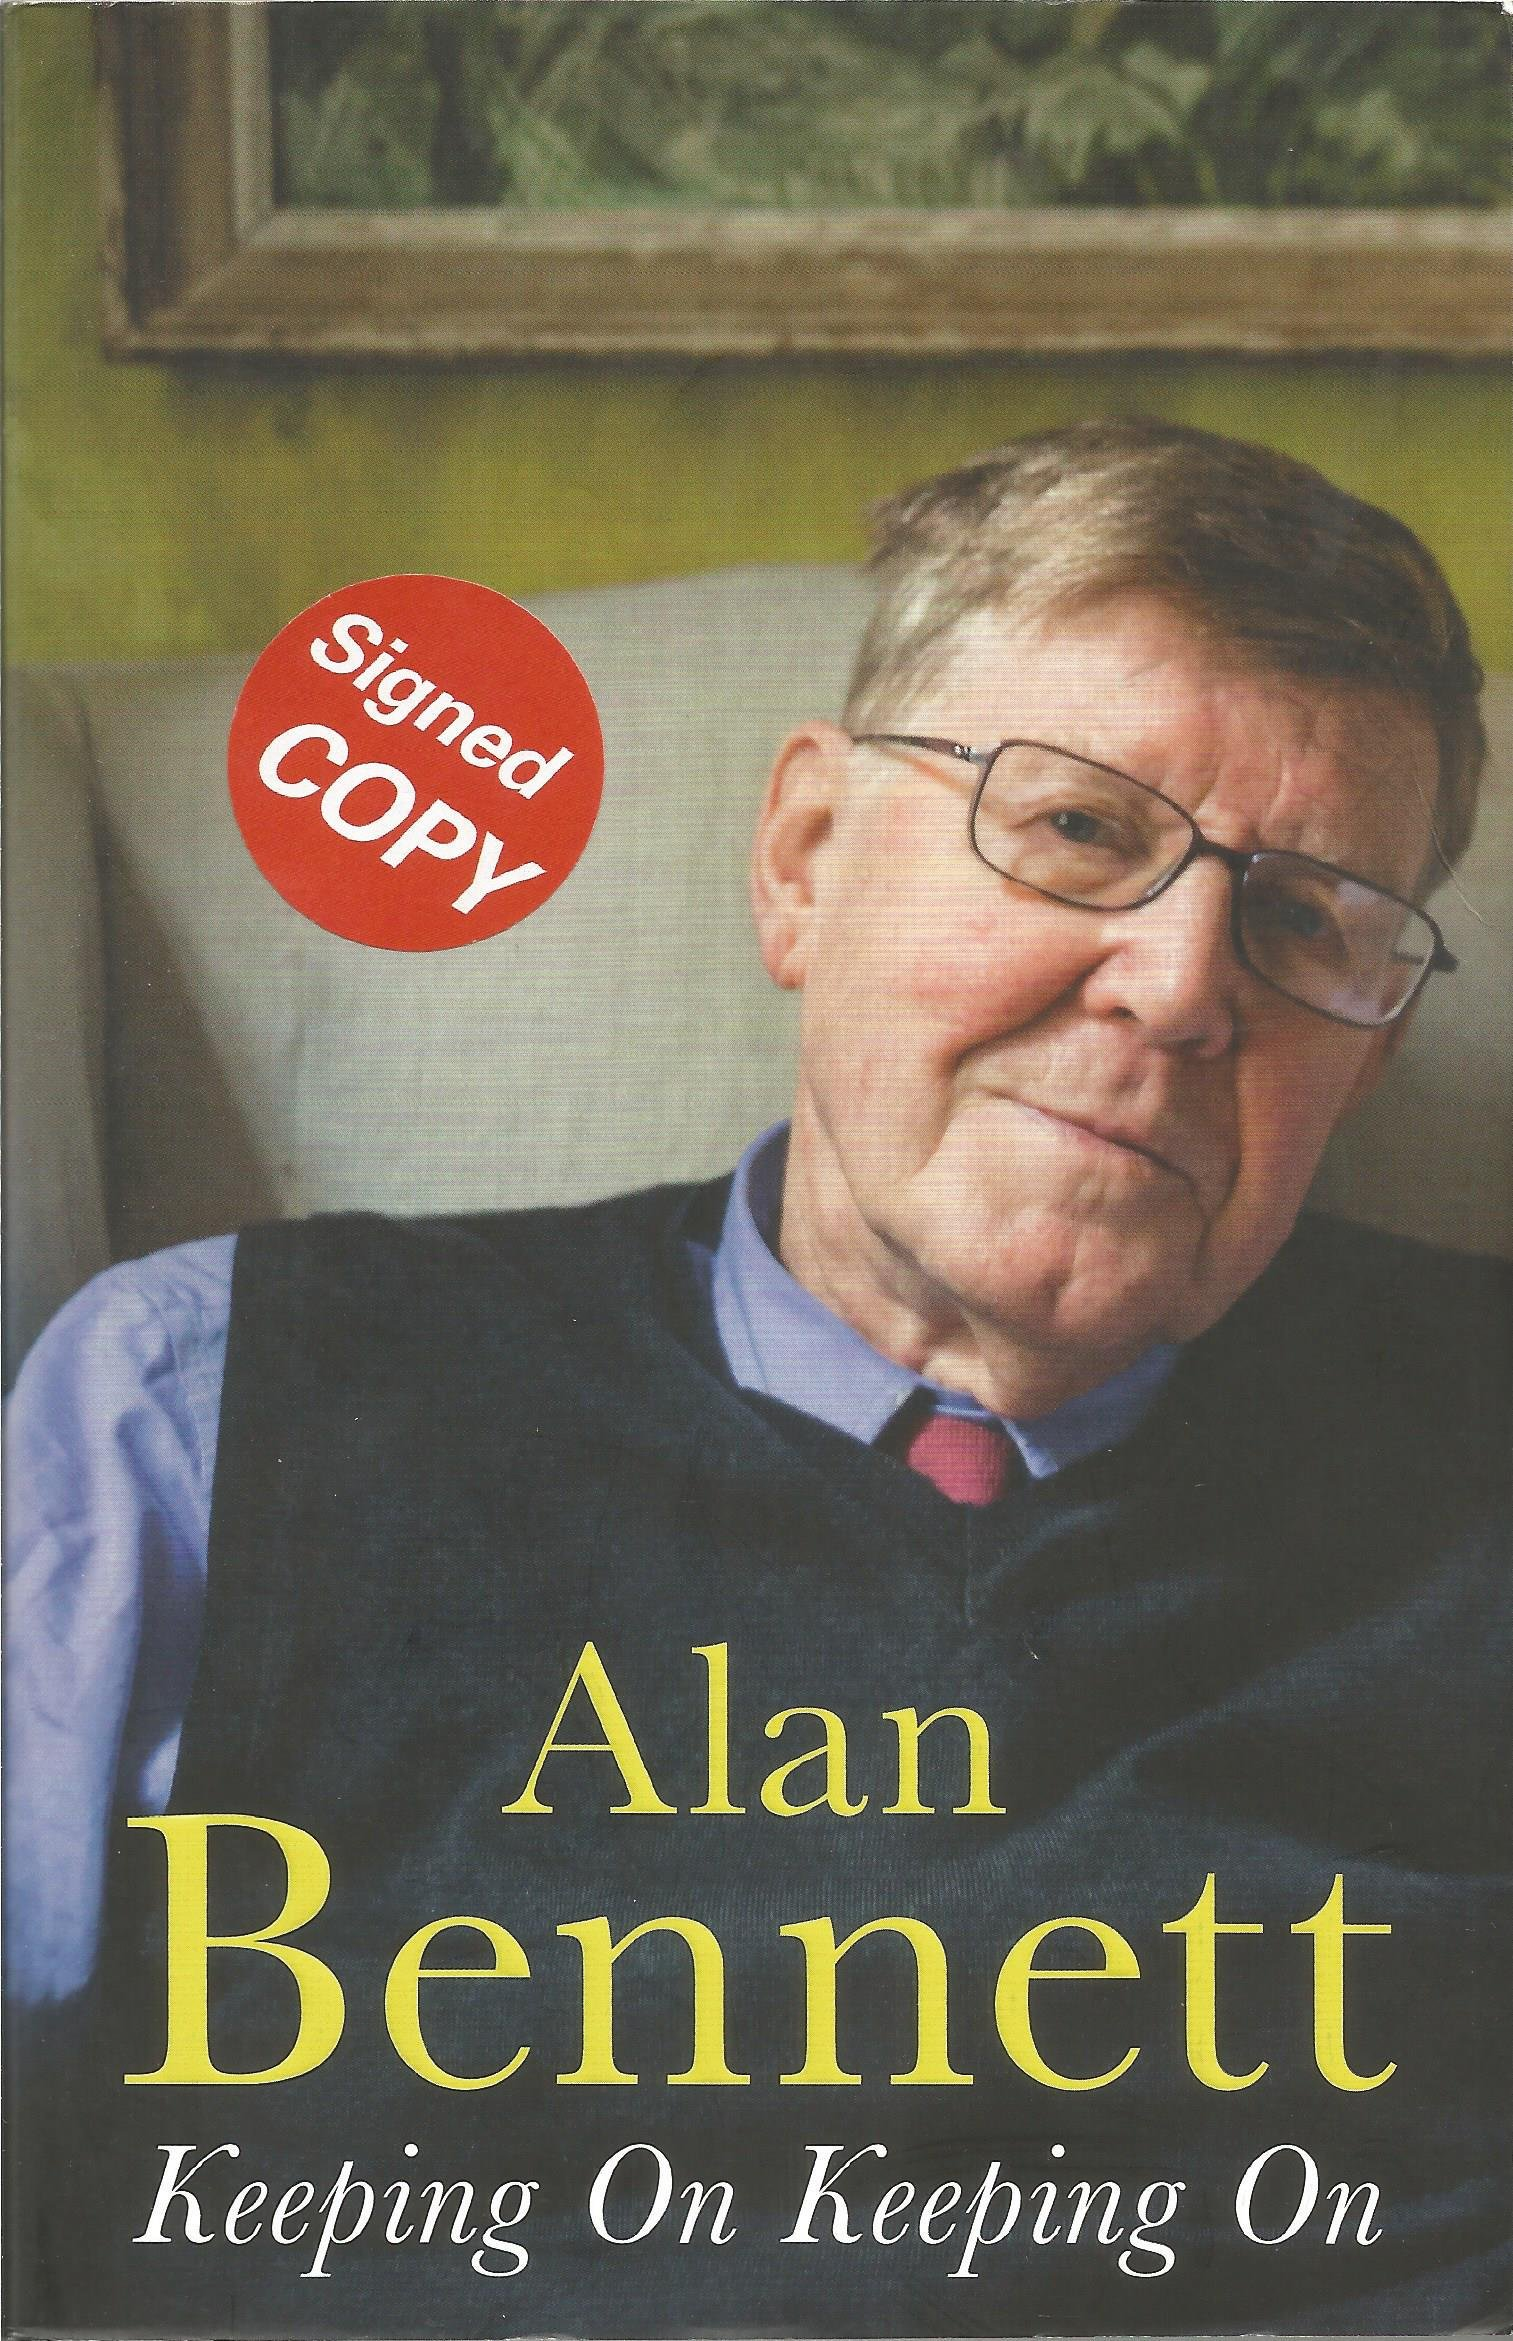 Alan Bennett signed softback book titled Keeping on